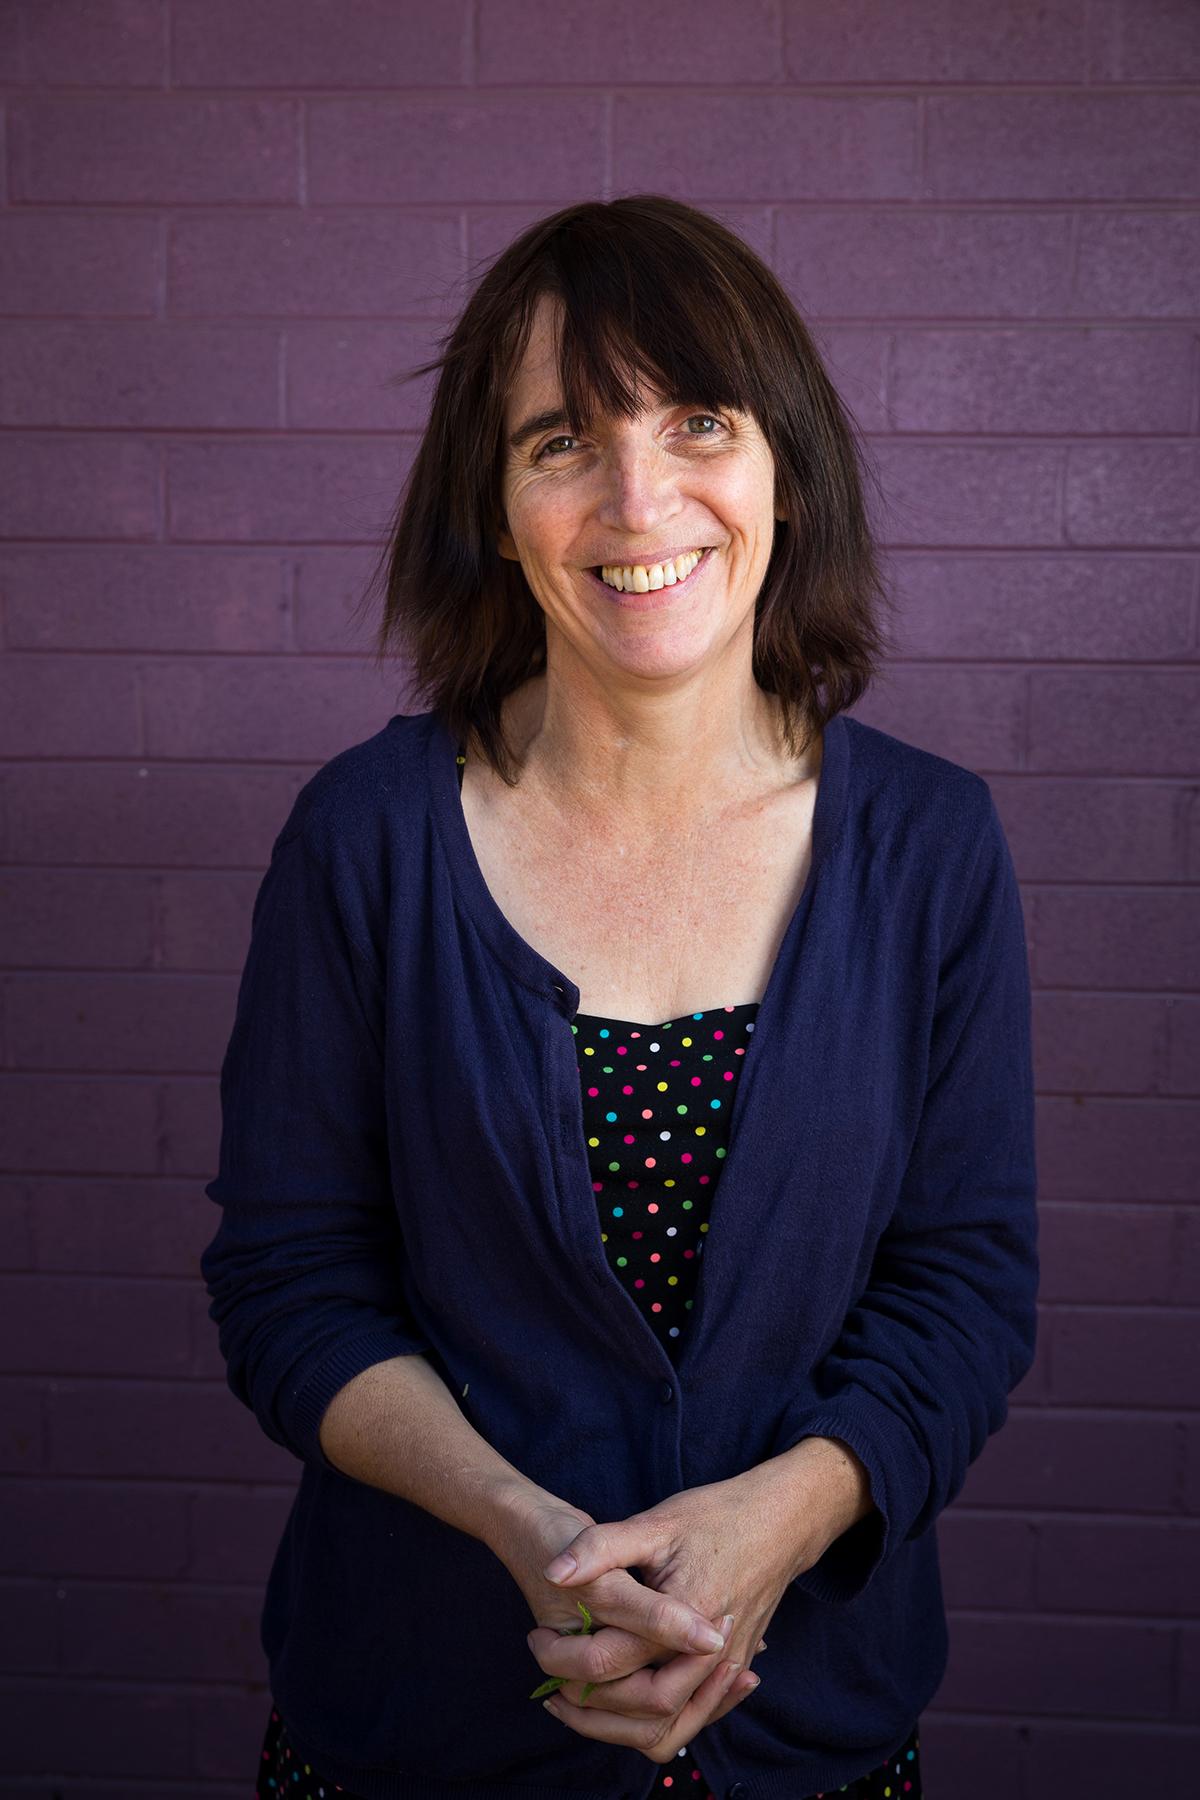 Sarah Brown in front of the purple walls of Western Desert Dialysis in Alice Springs